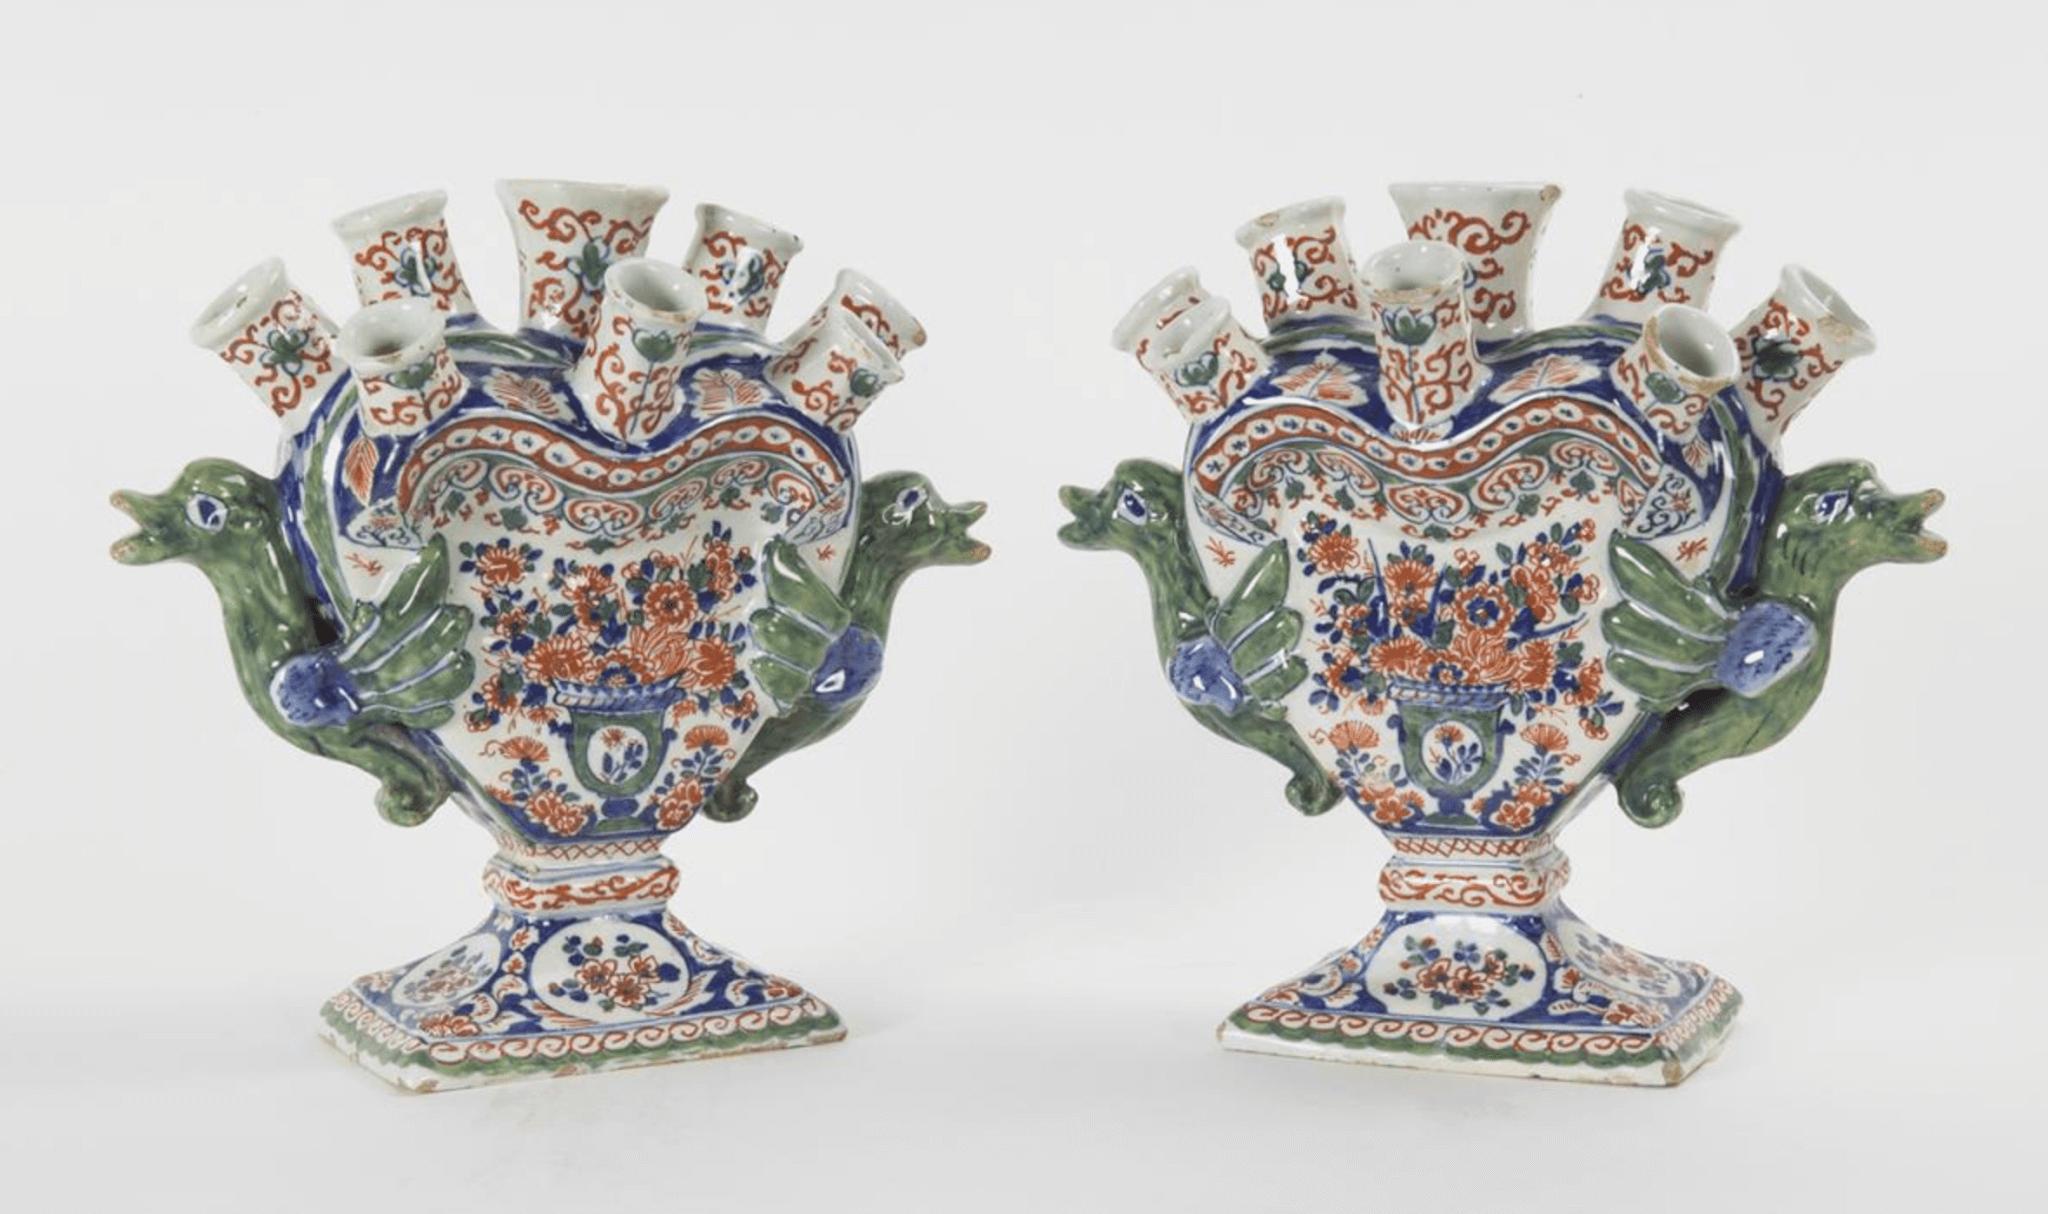 Cashmere Delftware vases